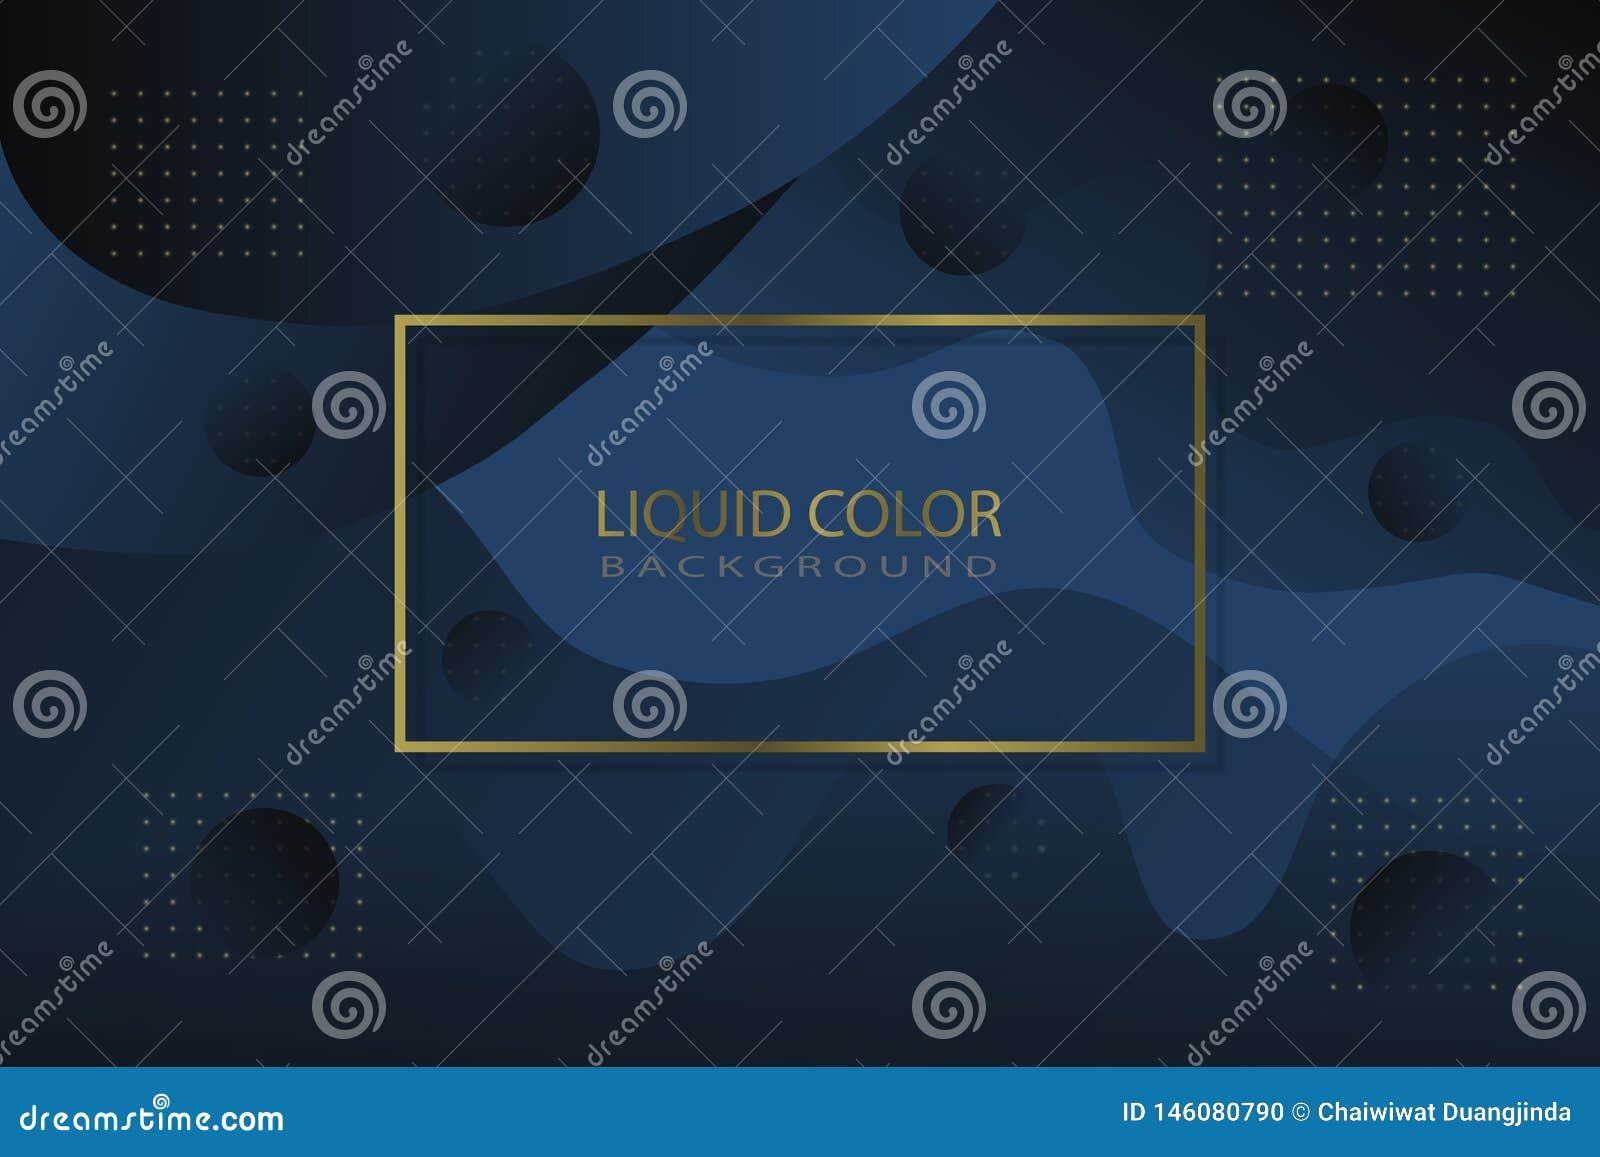 Luxe vloeibare kleur als achtergrond